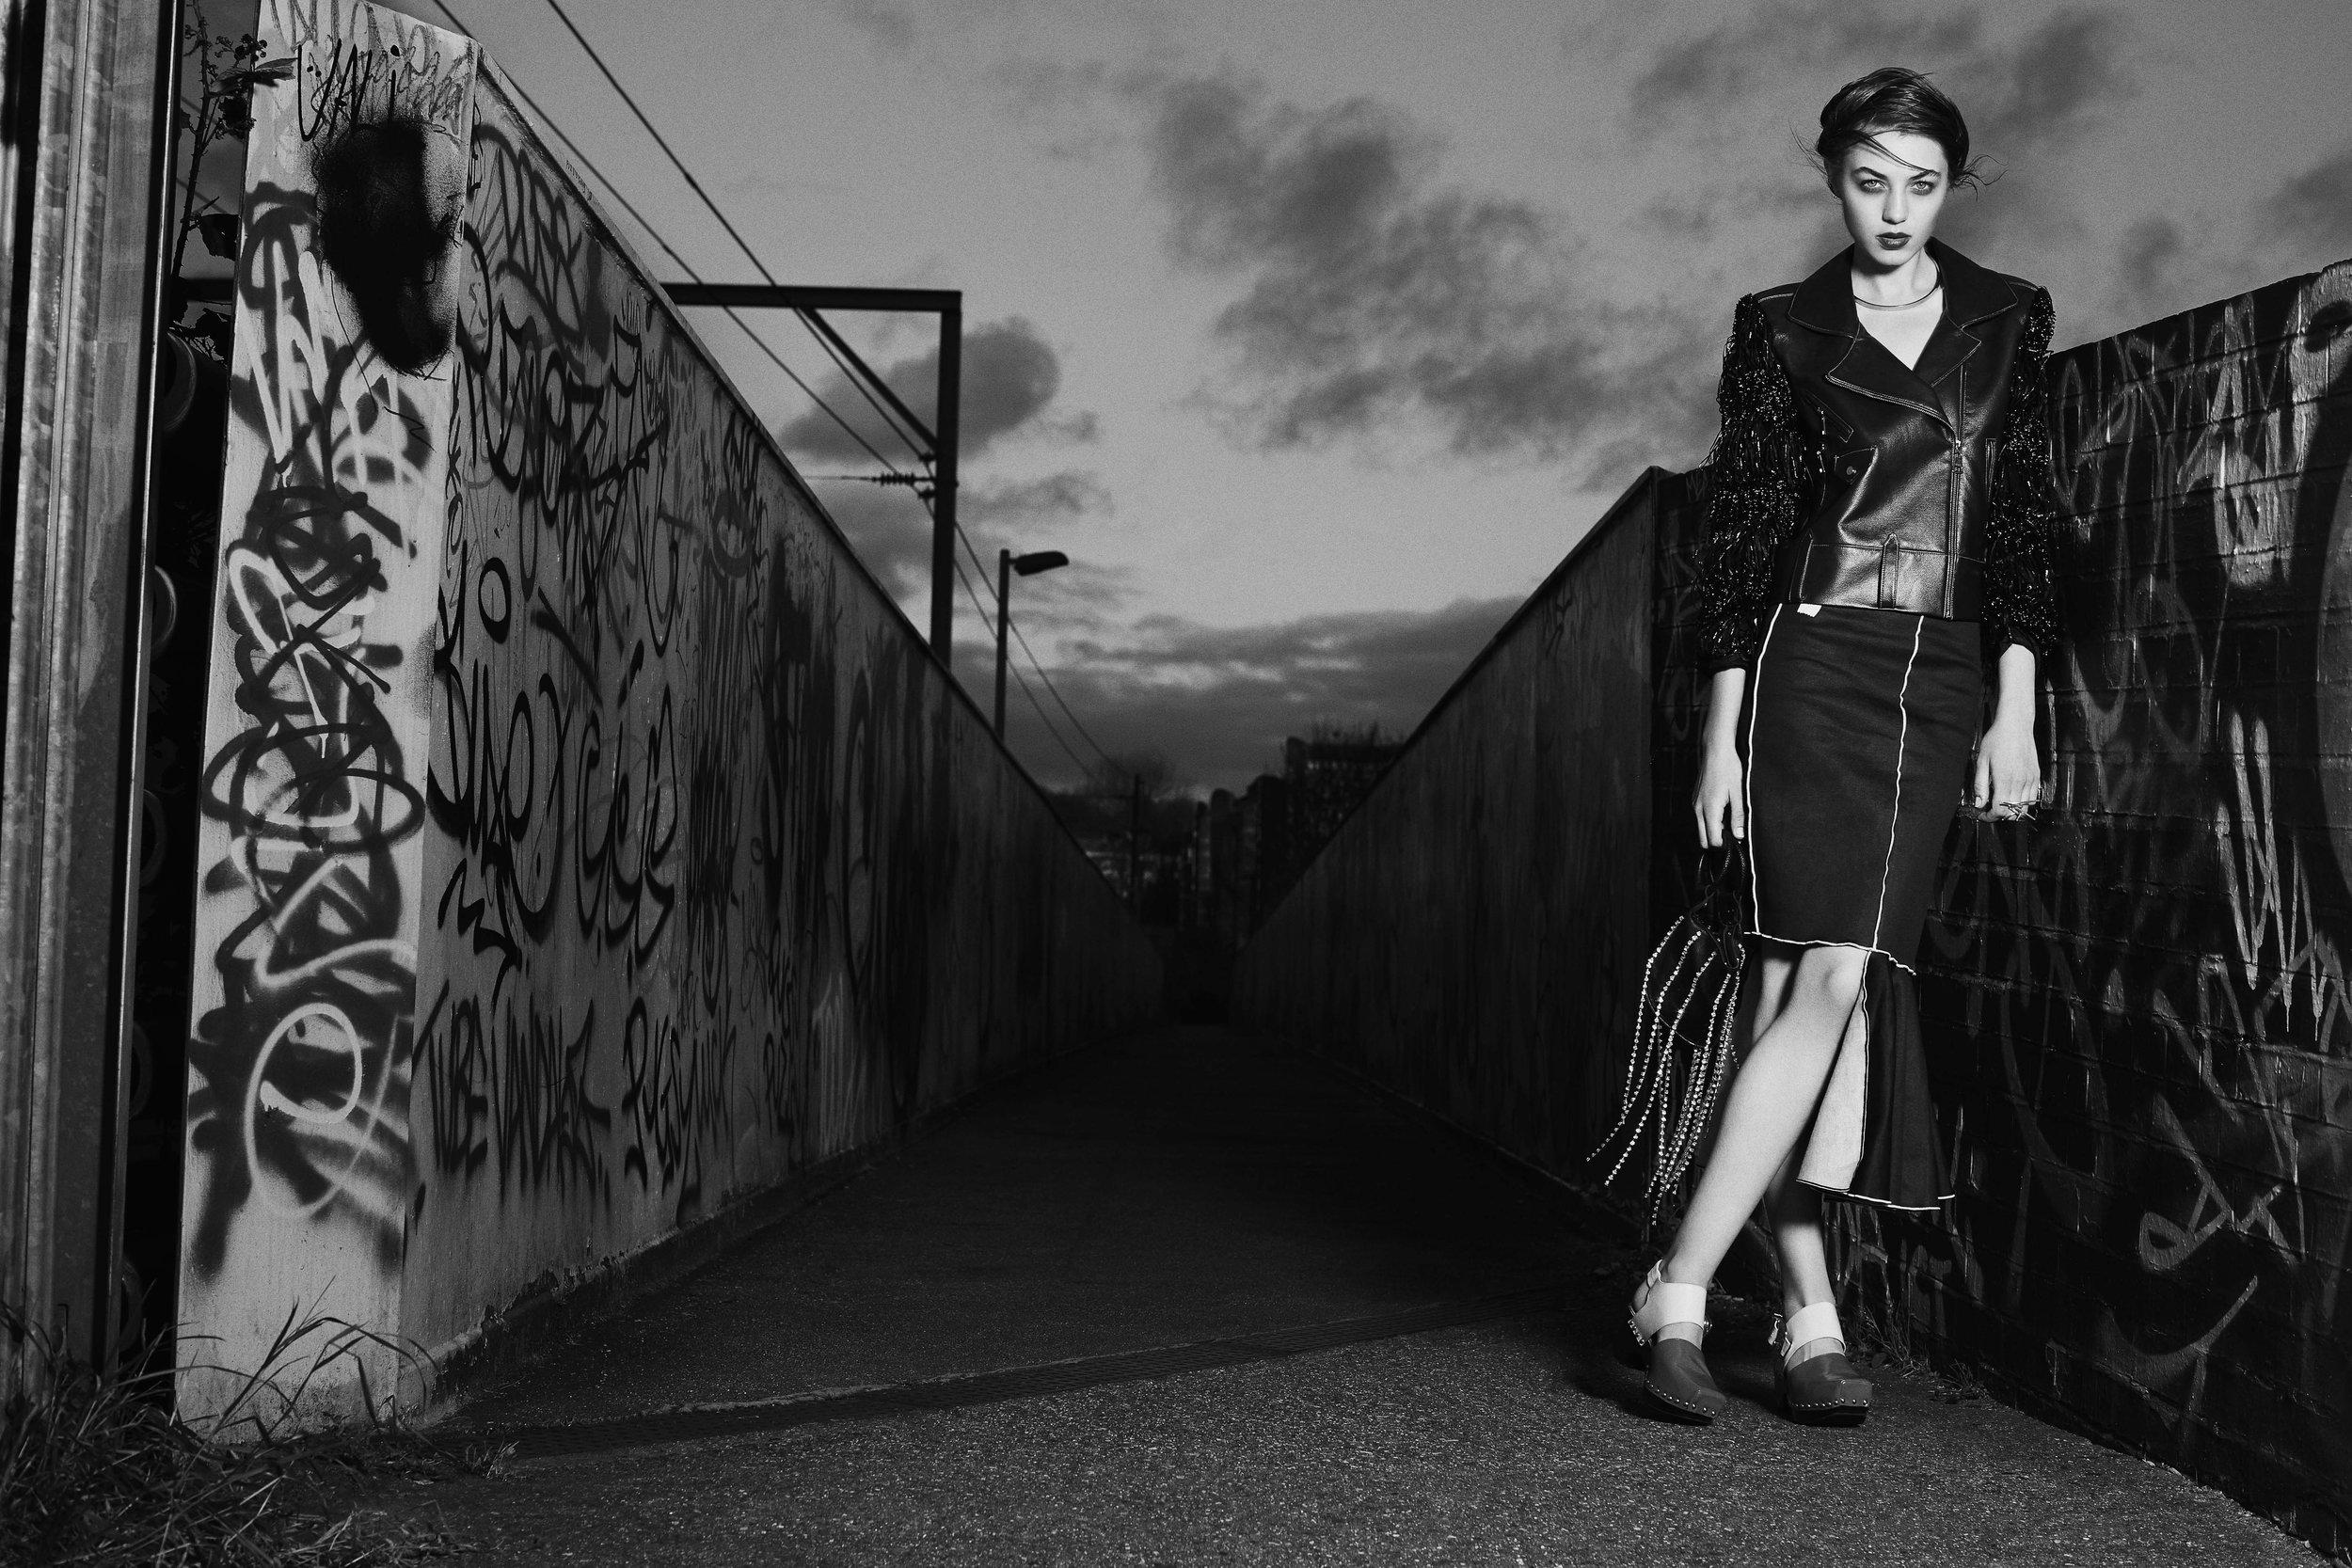 Jacket : BOO PALA Skirt : MINNAN HUI Necklace : PILGRIM  Ring : LINNIE MCLARTY Bag : EMMA CHARLES Footwear : TOGA PULLA